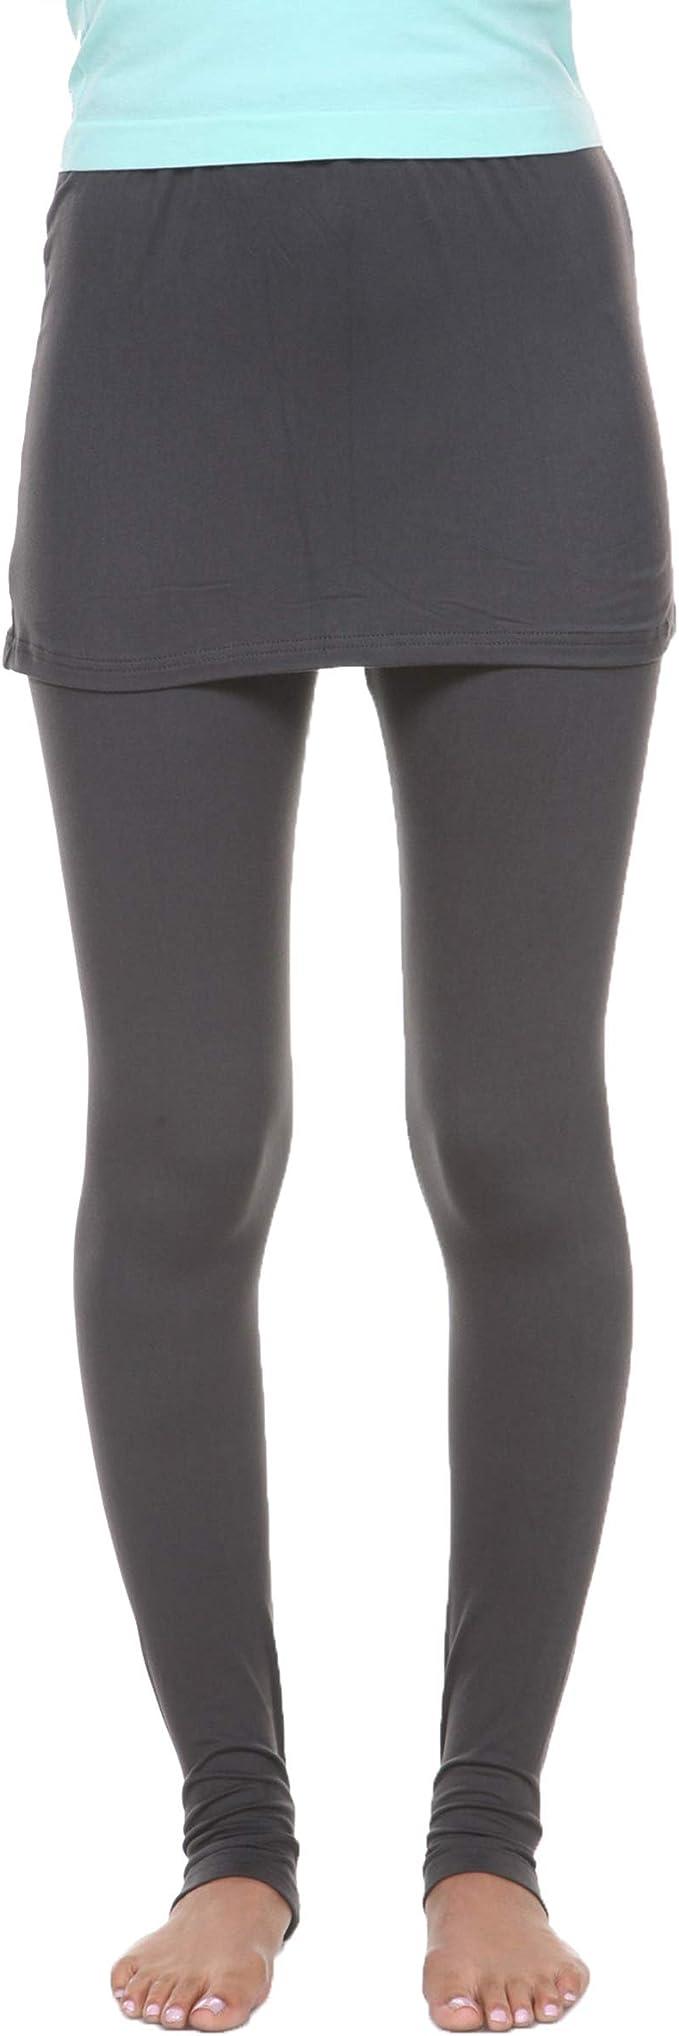 Amazon.com: White Mark - Leggings para mujer con falda de ...